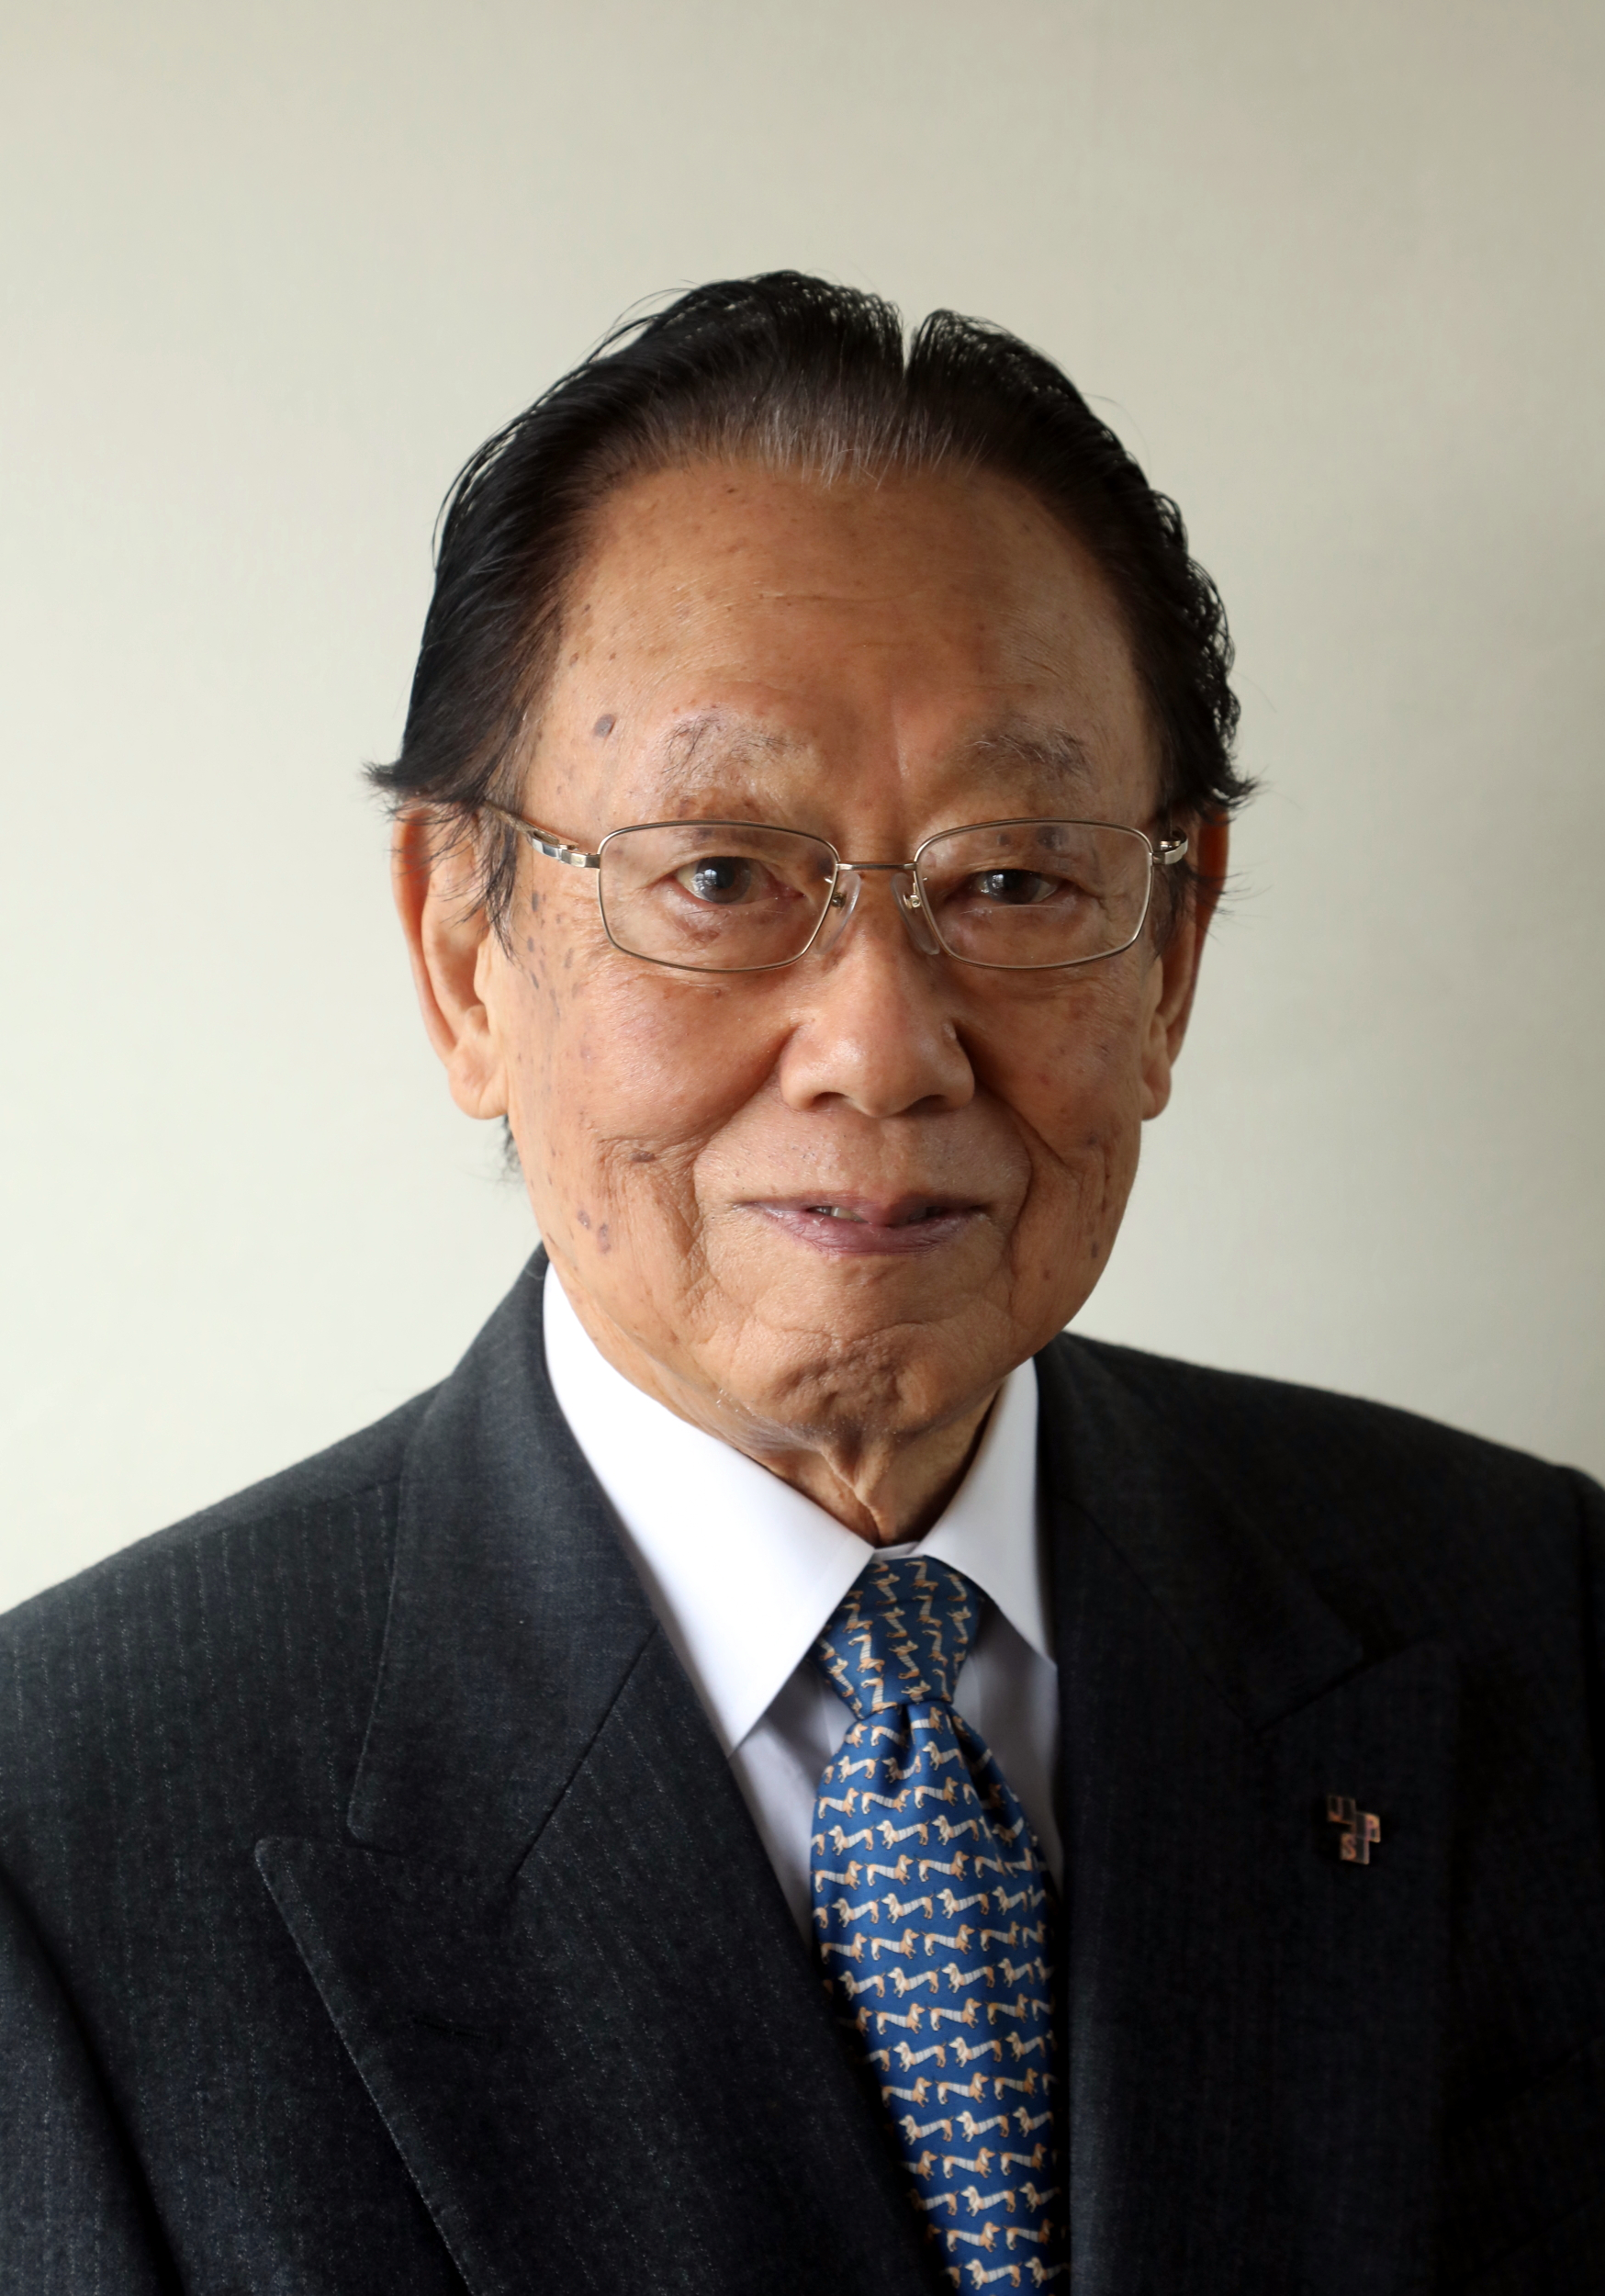 Image of Takeyoshi Tanuma from Wikidata